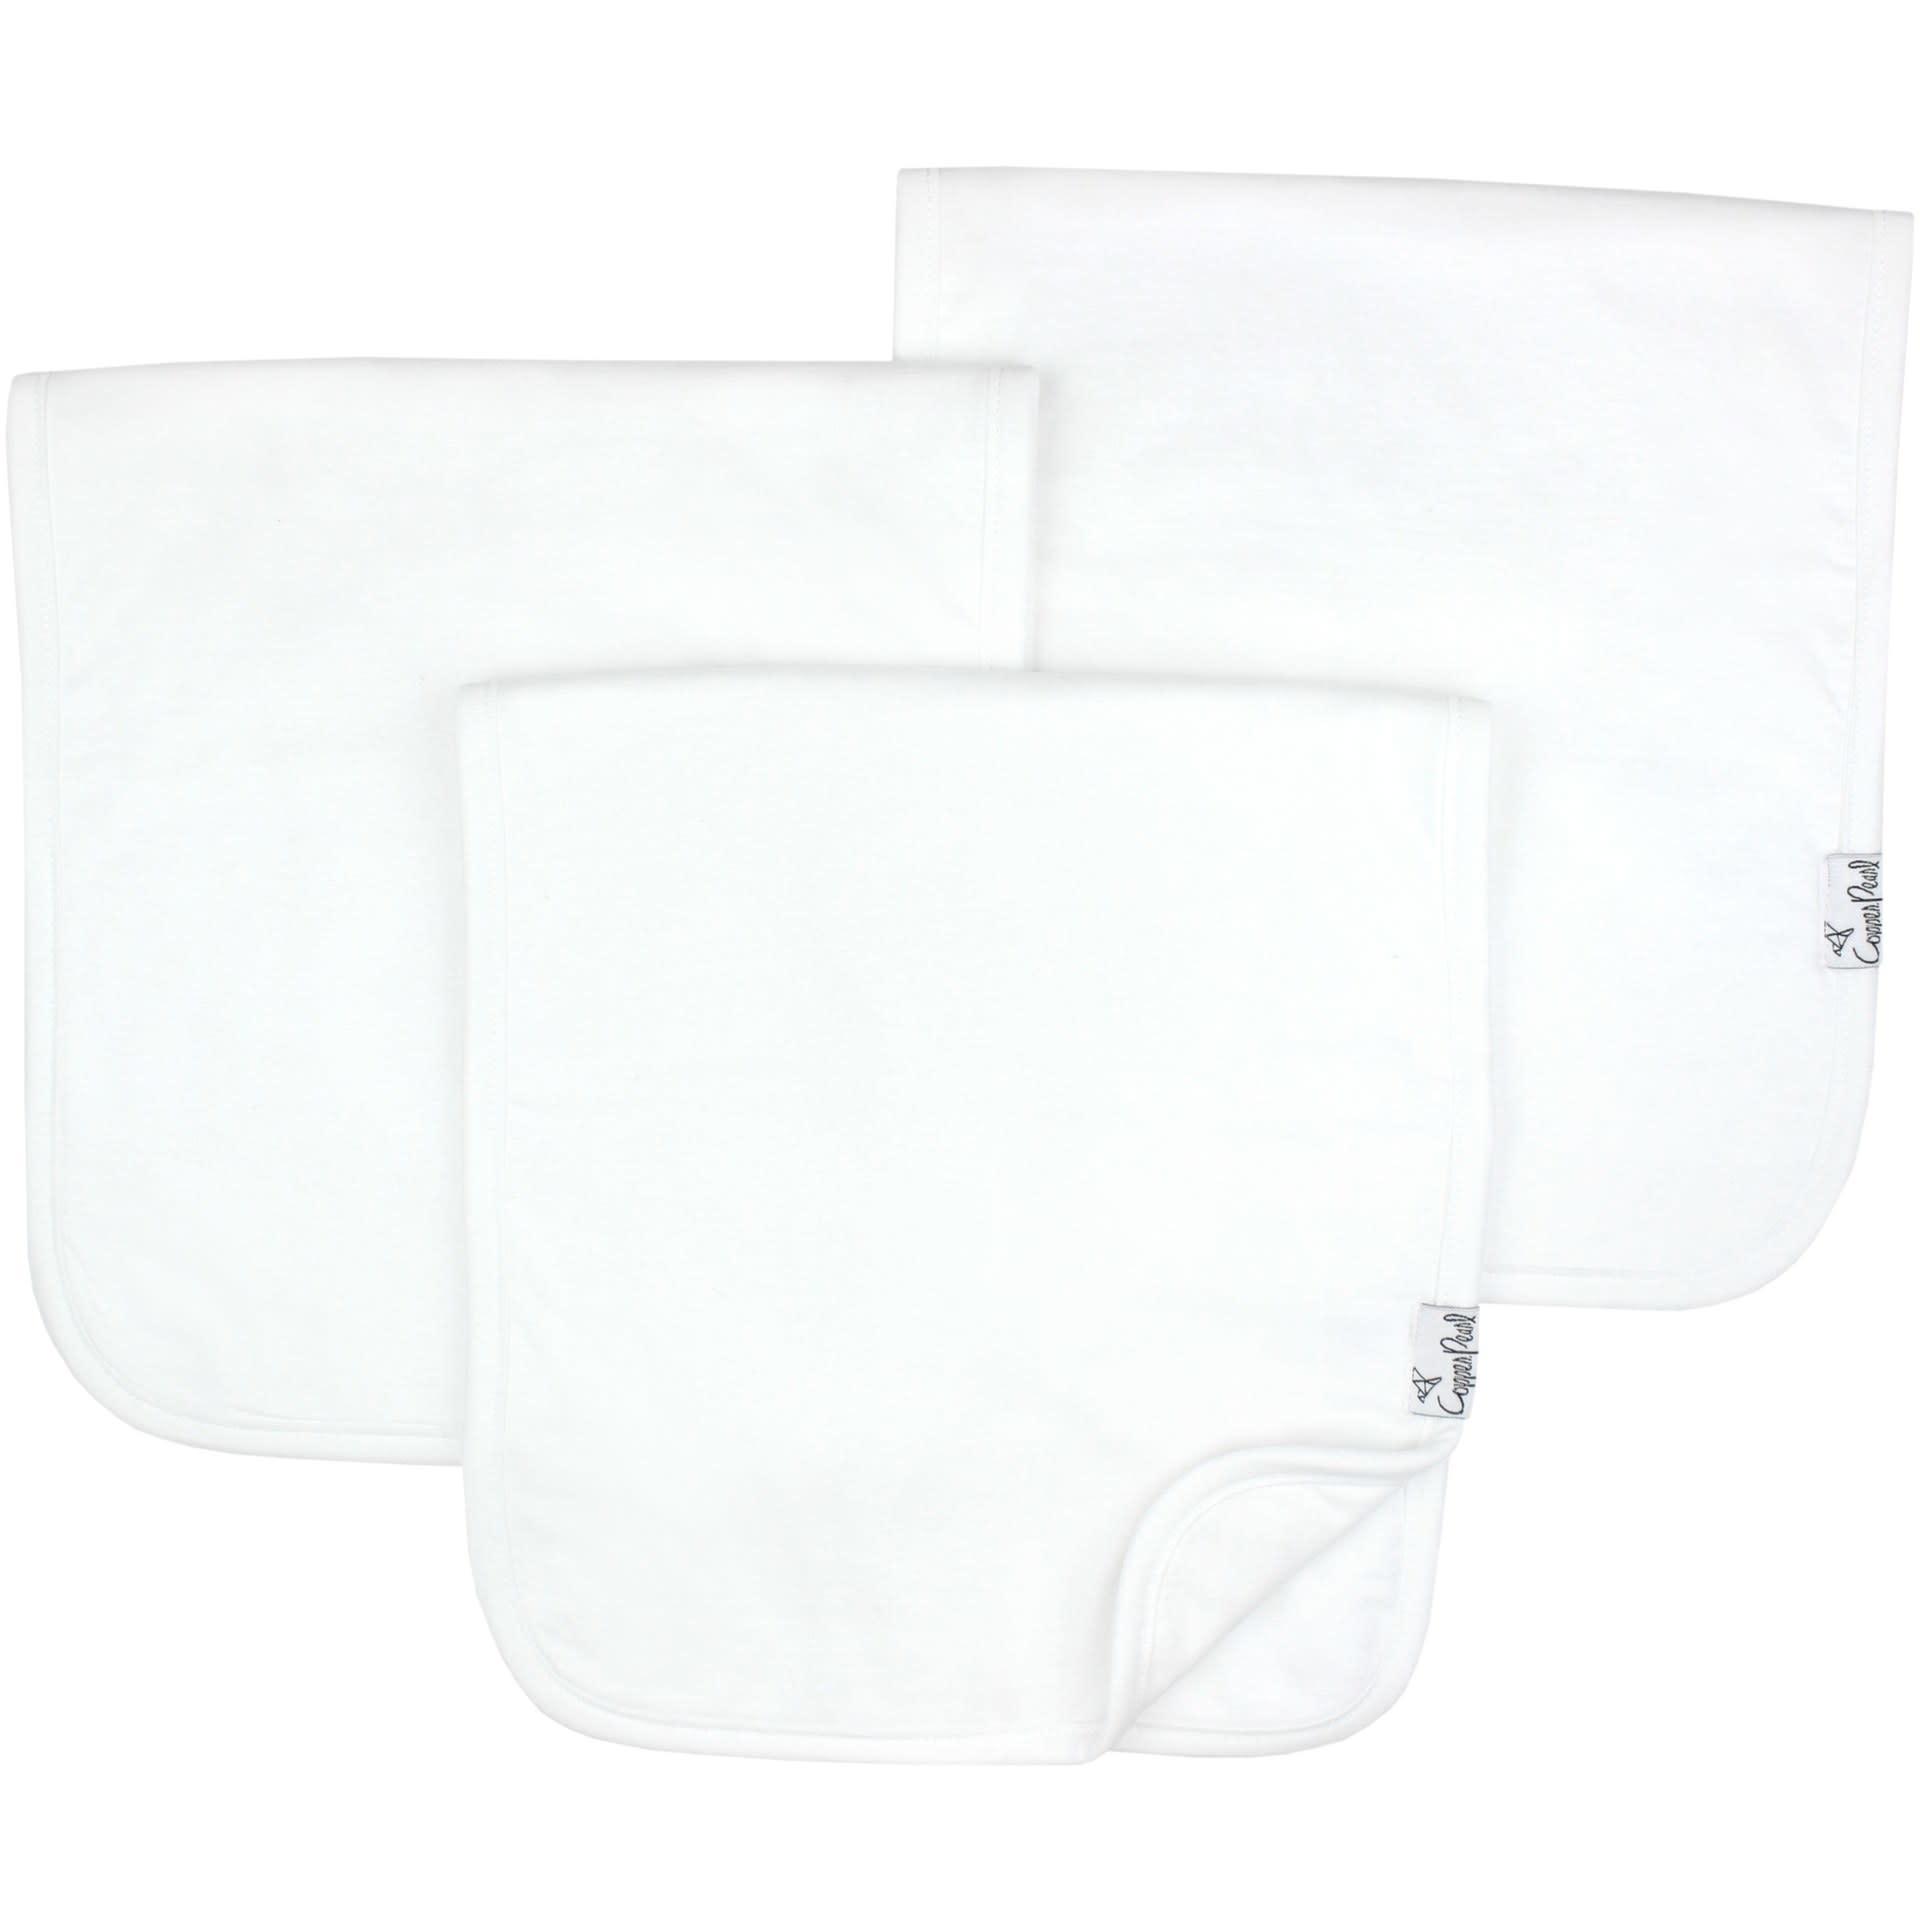 Copper Pearl Burp Cloths (3 pack) - White